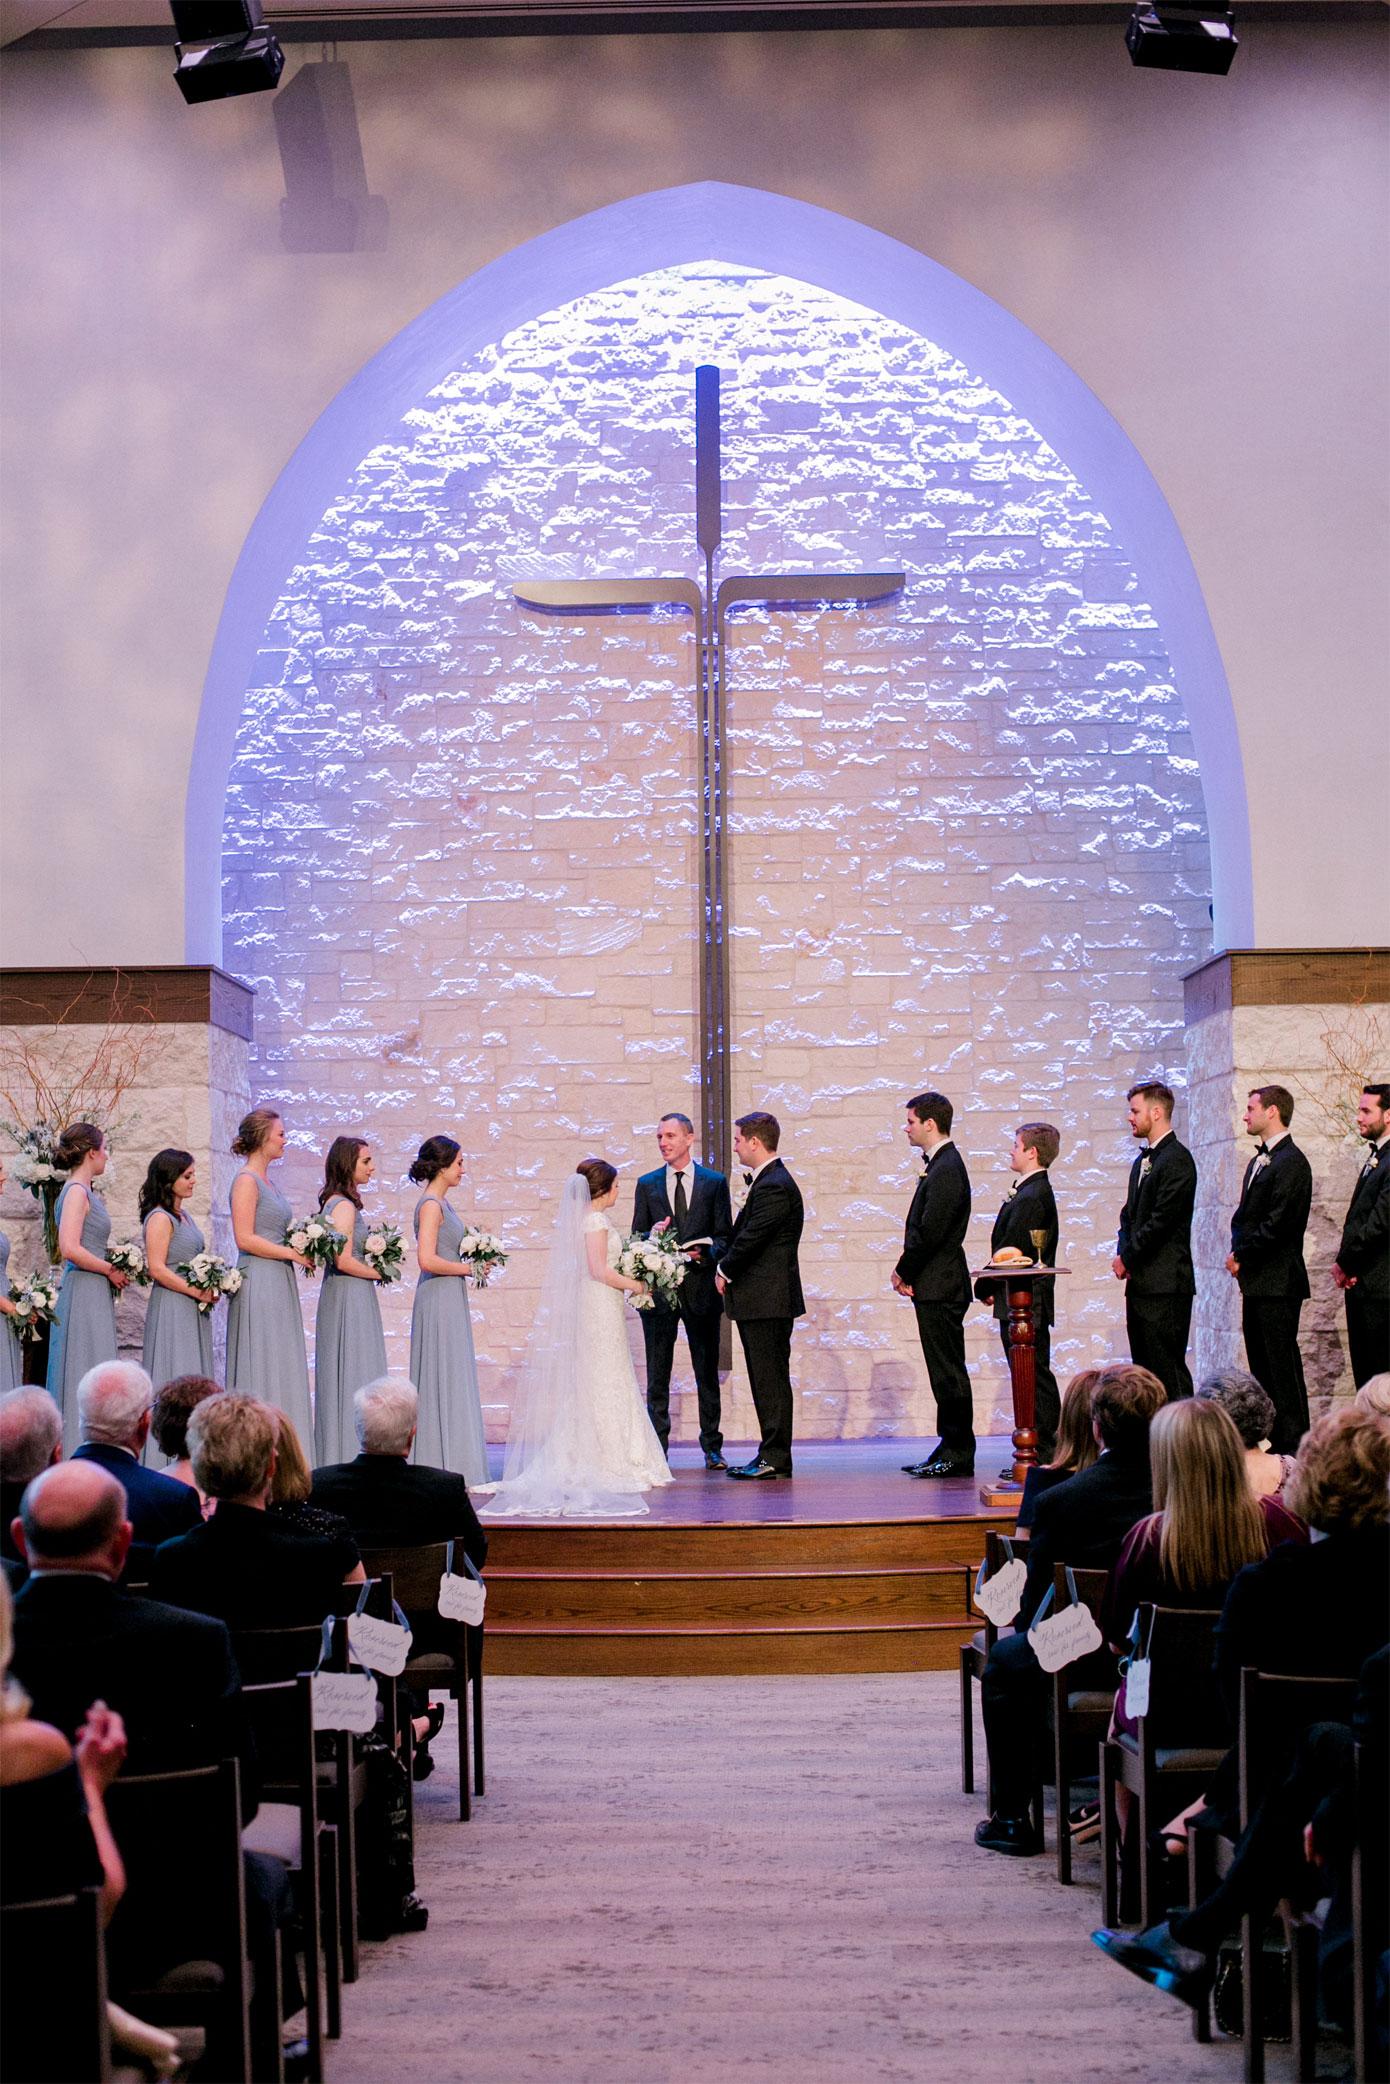 Susannah-Zach-Wedding-0256.jpg